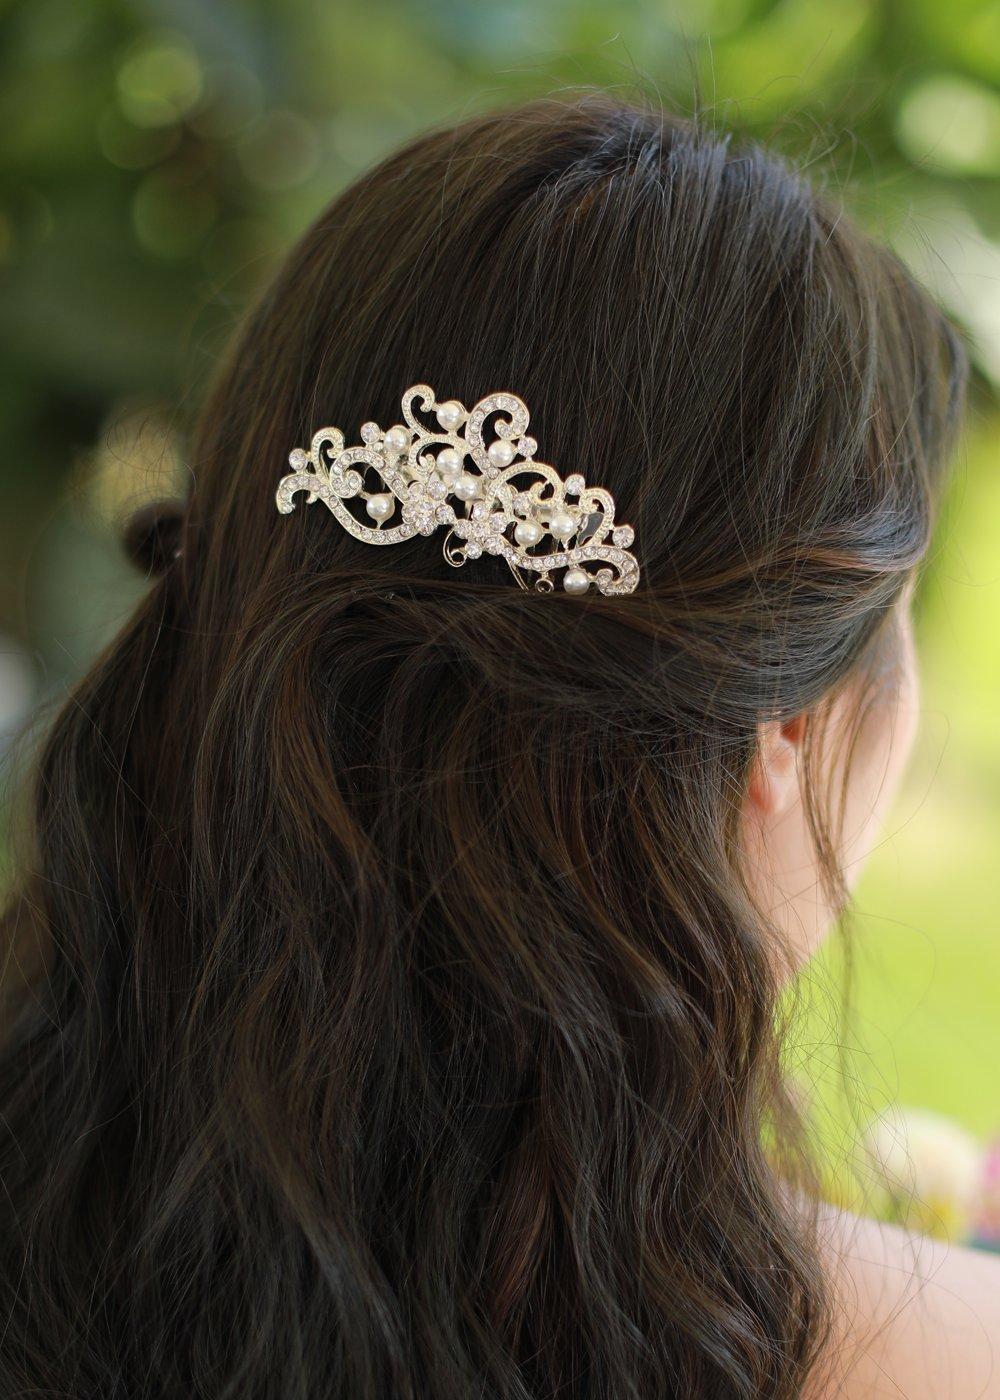 00ea623c1db Amazon.com  Missgrace Rhinestone Jewelry Comb Bridal Headpiece Hair Clip  Women Hair Accessories(Gold)  Beauty